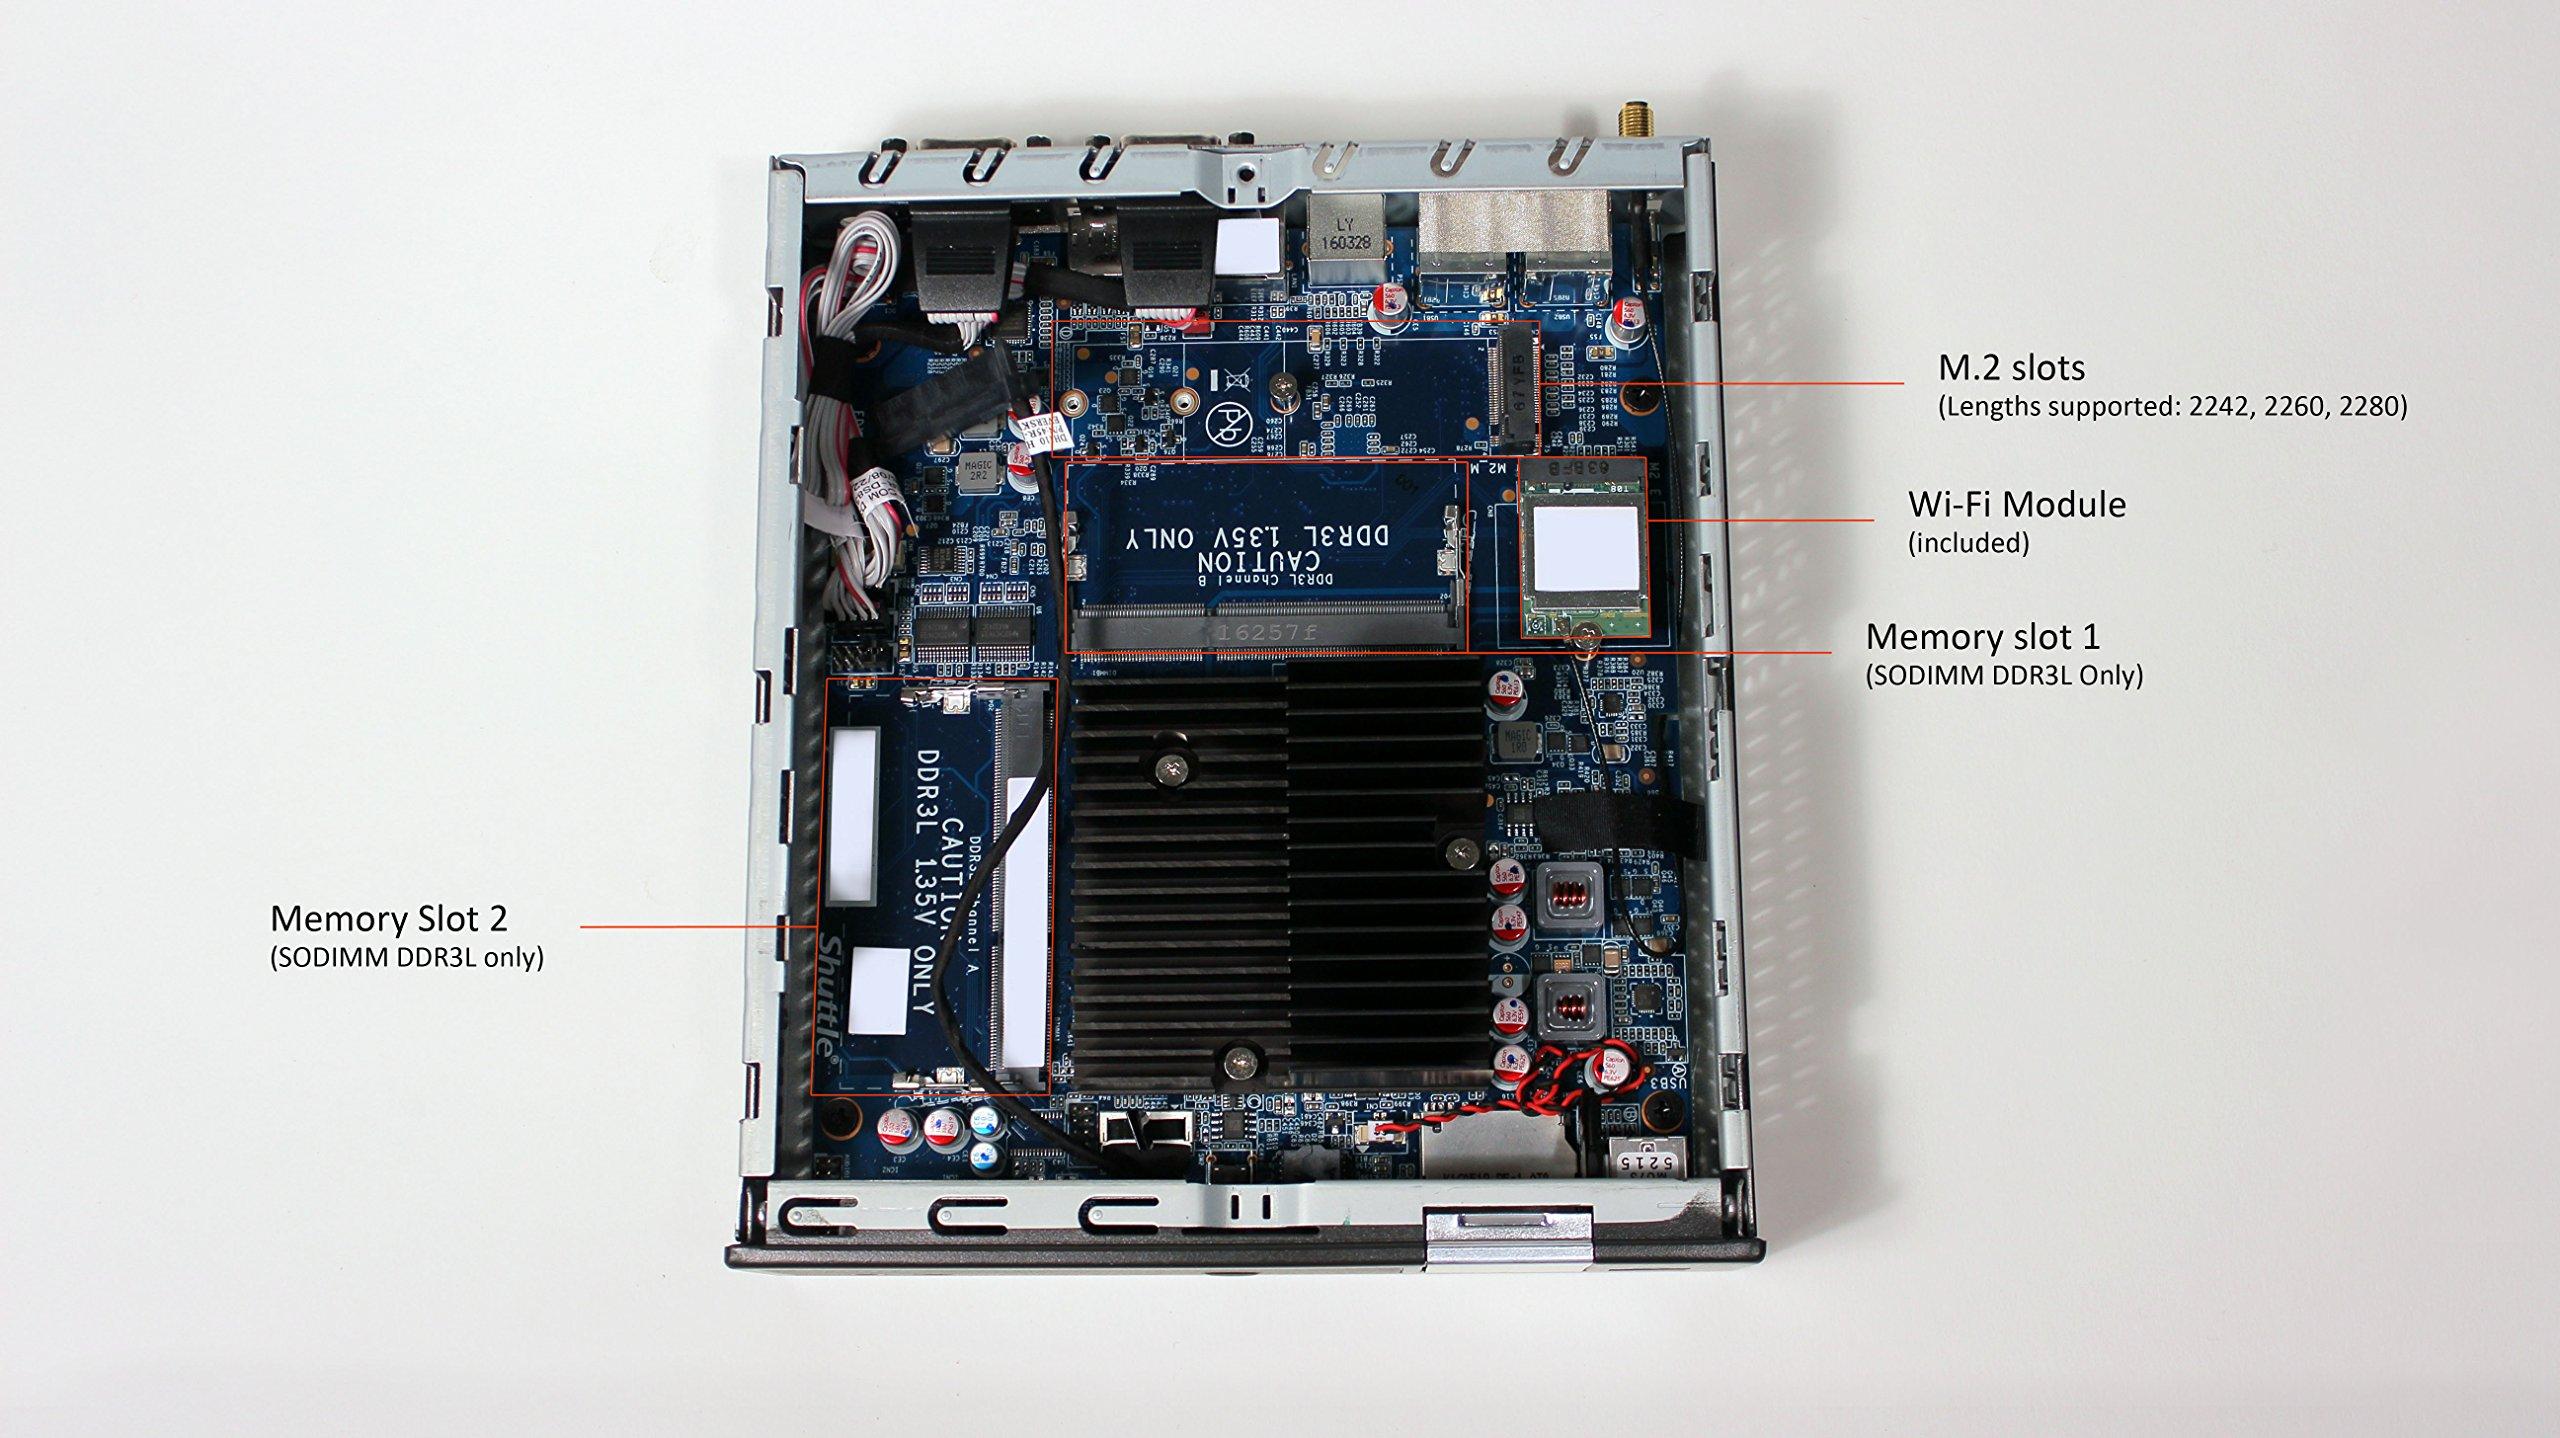 Shuttle XPC Slim DX30, Intel Apollolake Celeron J3355, Gigabit LAN, Dual COM Port, Fanless Design, DDR3L SODIMM Max 16GB by Shuttle (Image #5)